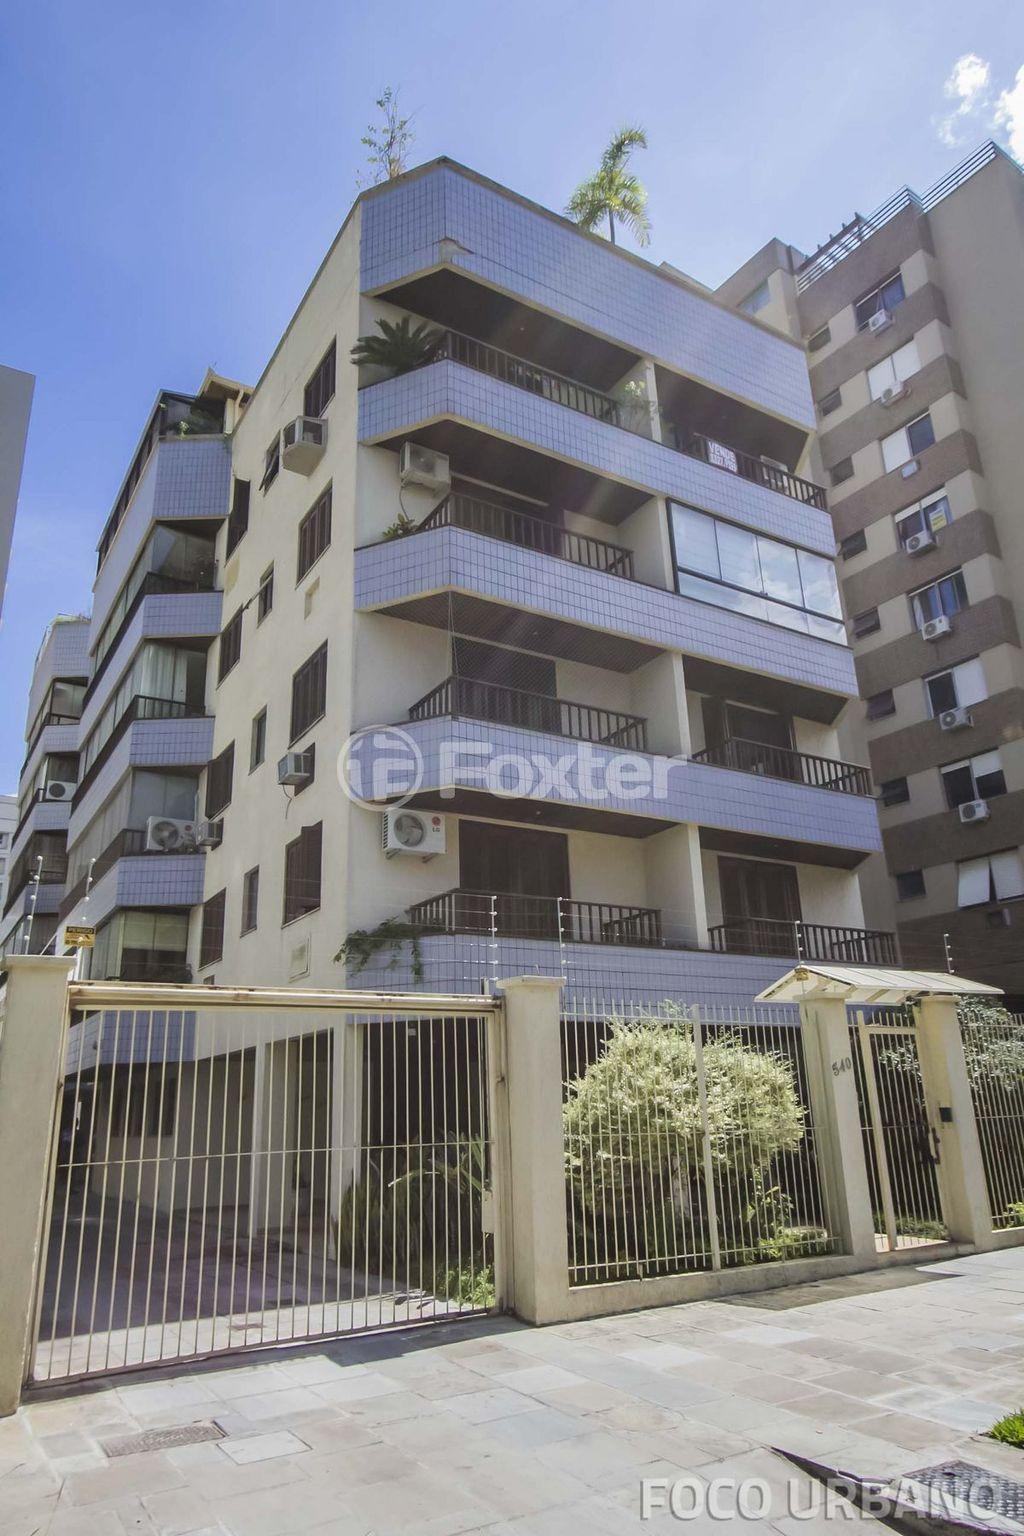 Residenza - Cobertura 2 Dorm, Bela Vista, Porto Alegre (185)